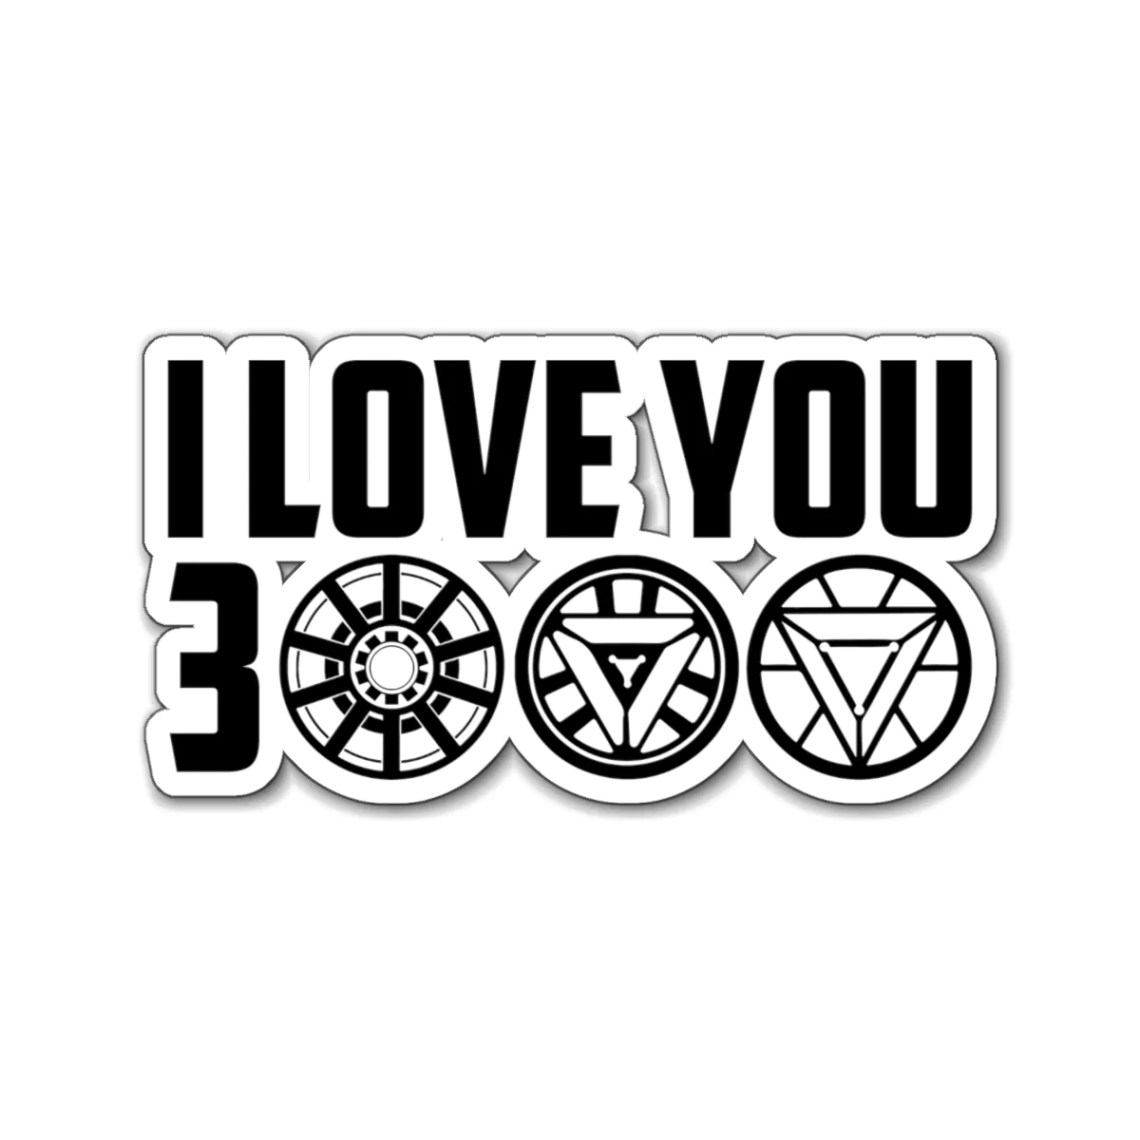 Download I Love You 3000 Avengers Endgame Magnet - HipsterZero